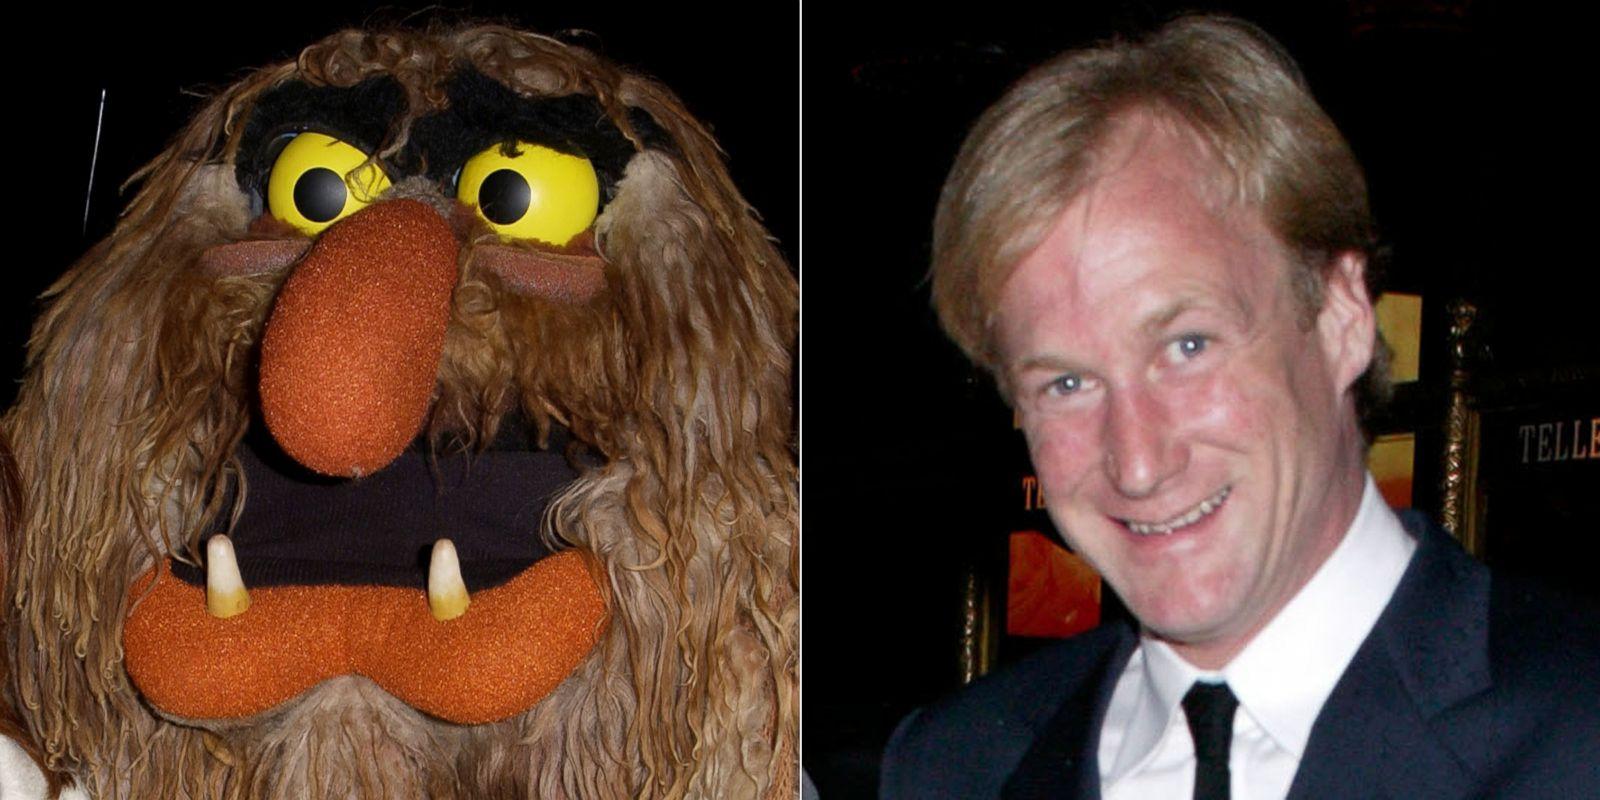 muppet creator jim hensons son john henson has died